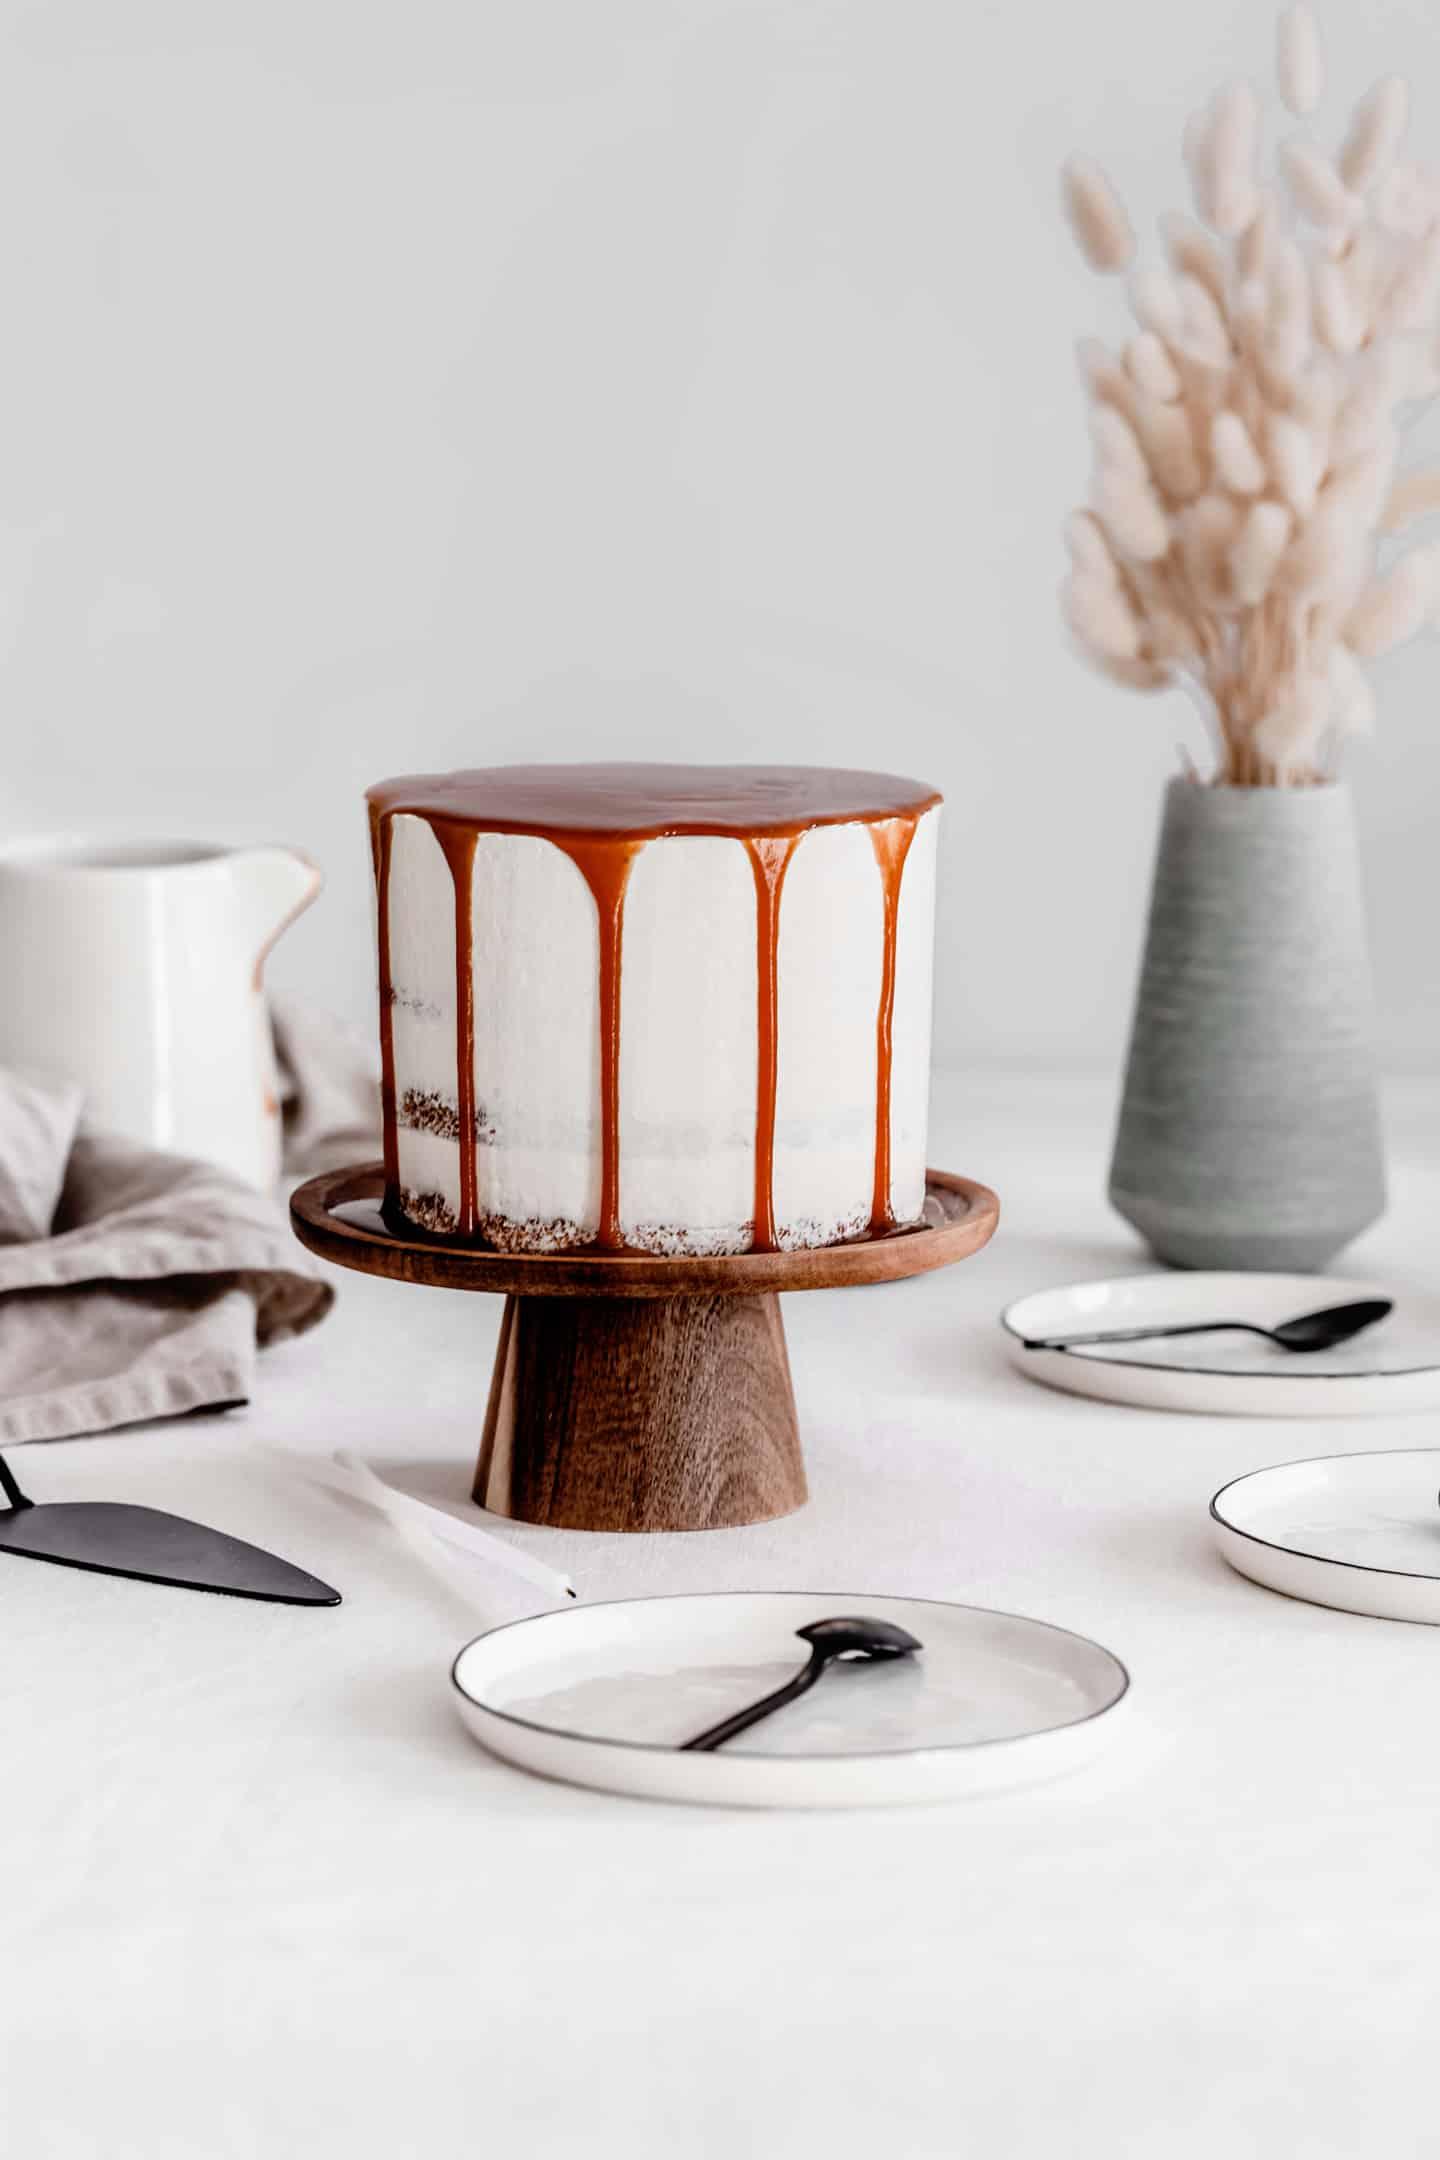 Layer cake vanille et caramel salé